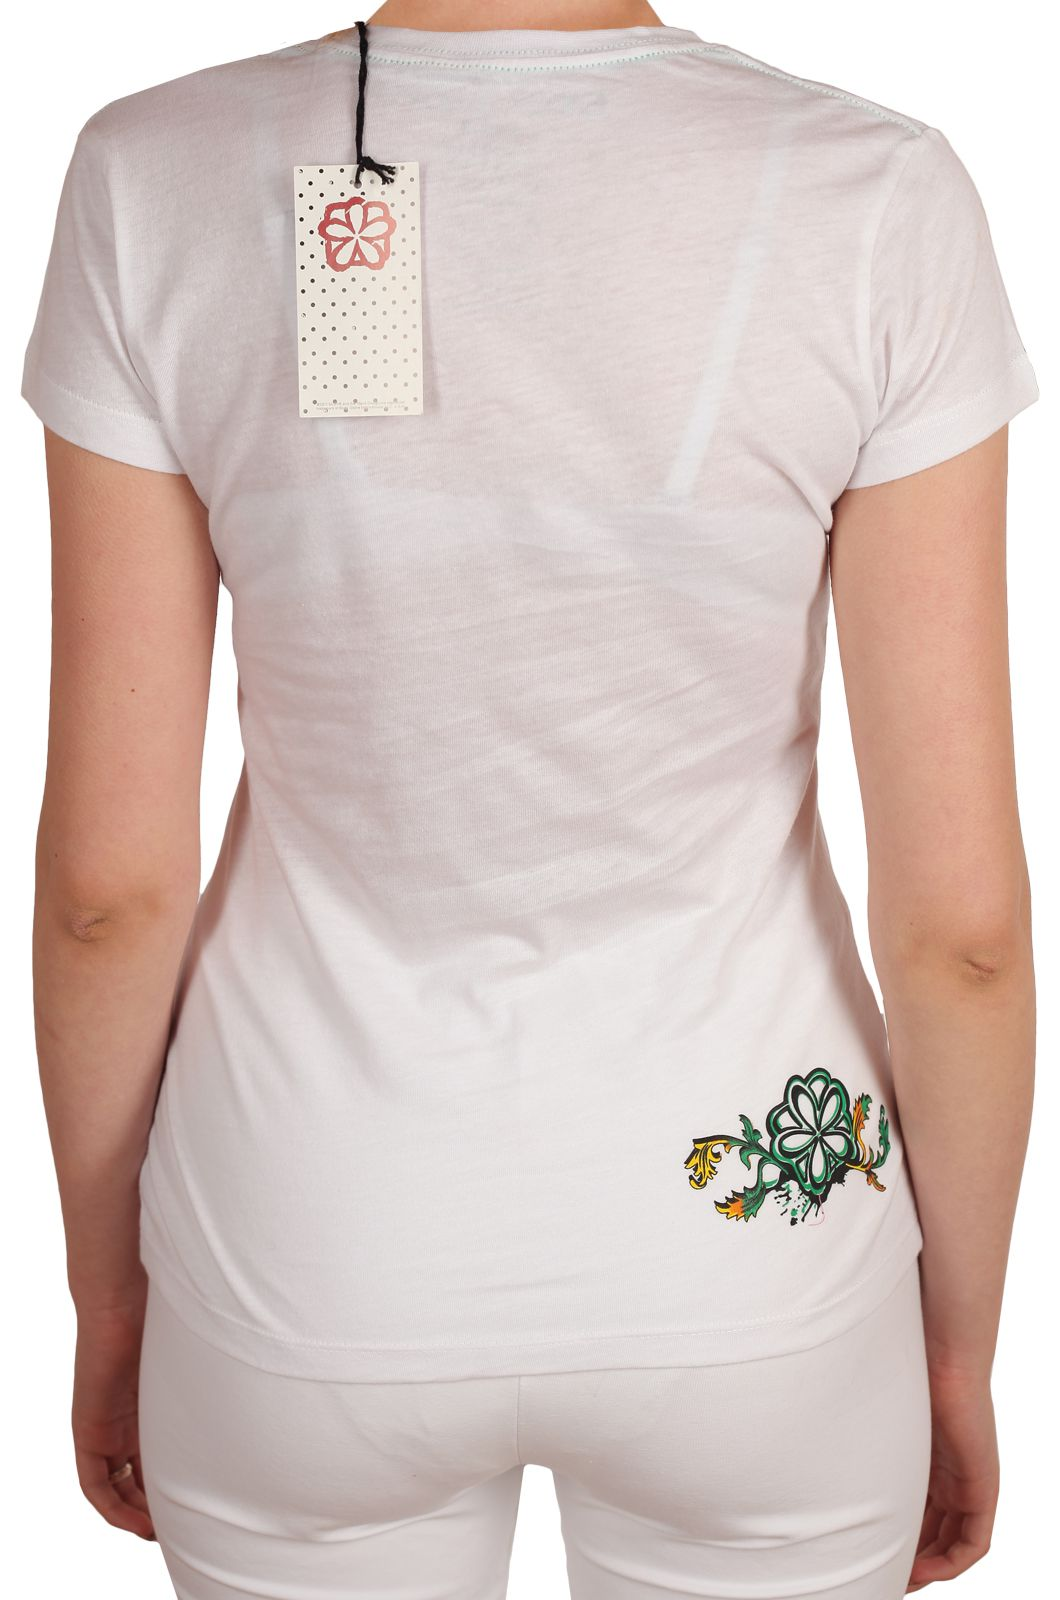 Женская футболка от Body Glove® - КОЛЛЕКЦИЯ ЛЕТО 2017! - вид сзади